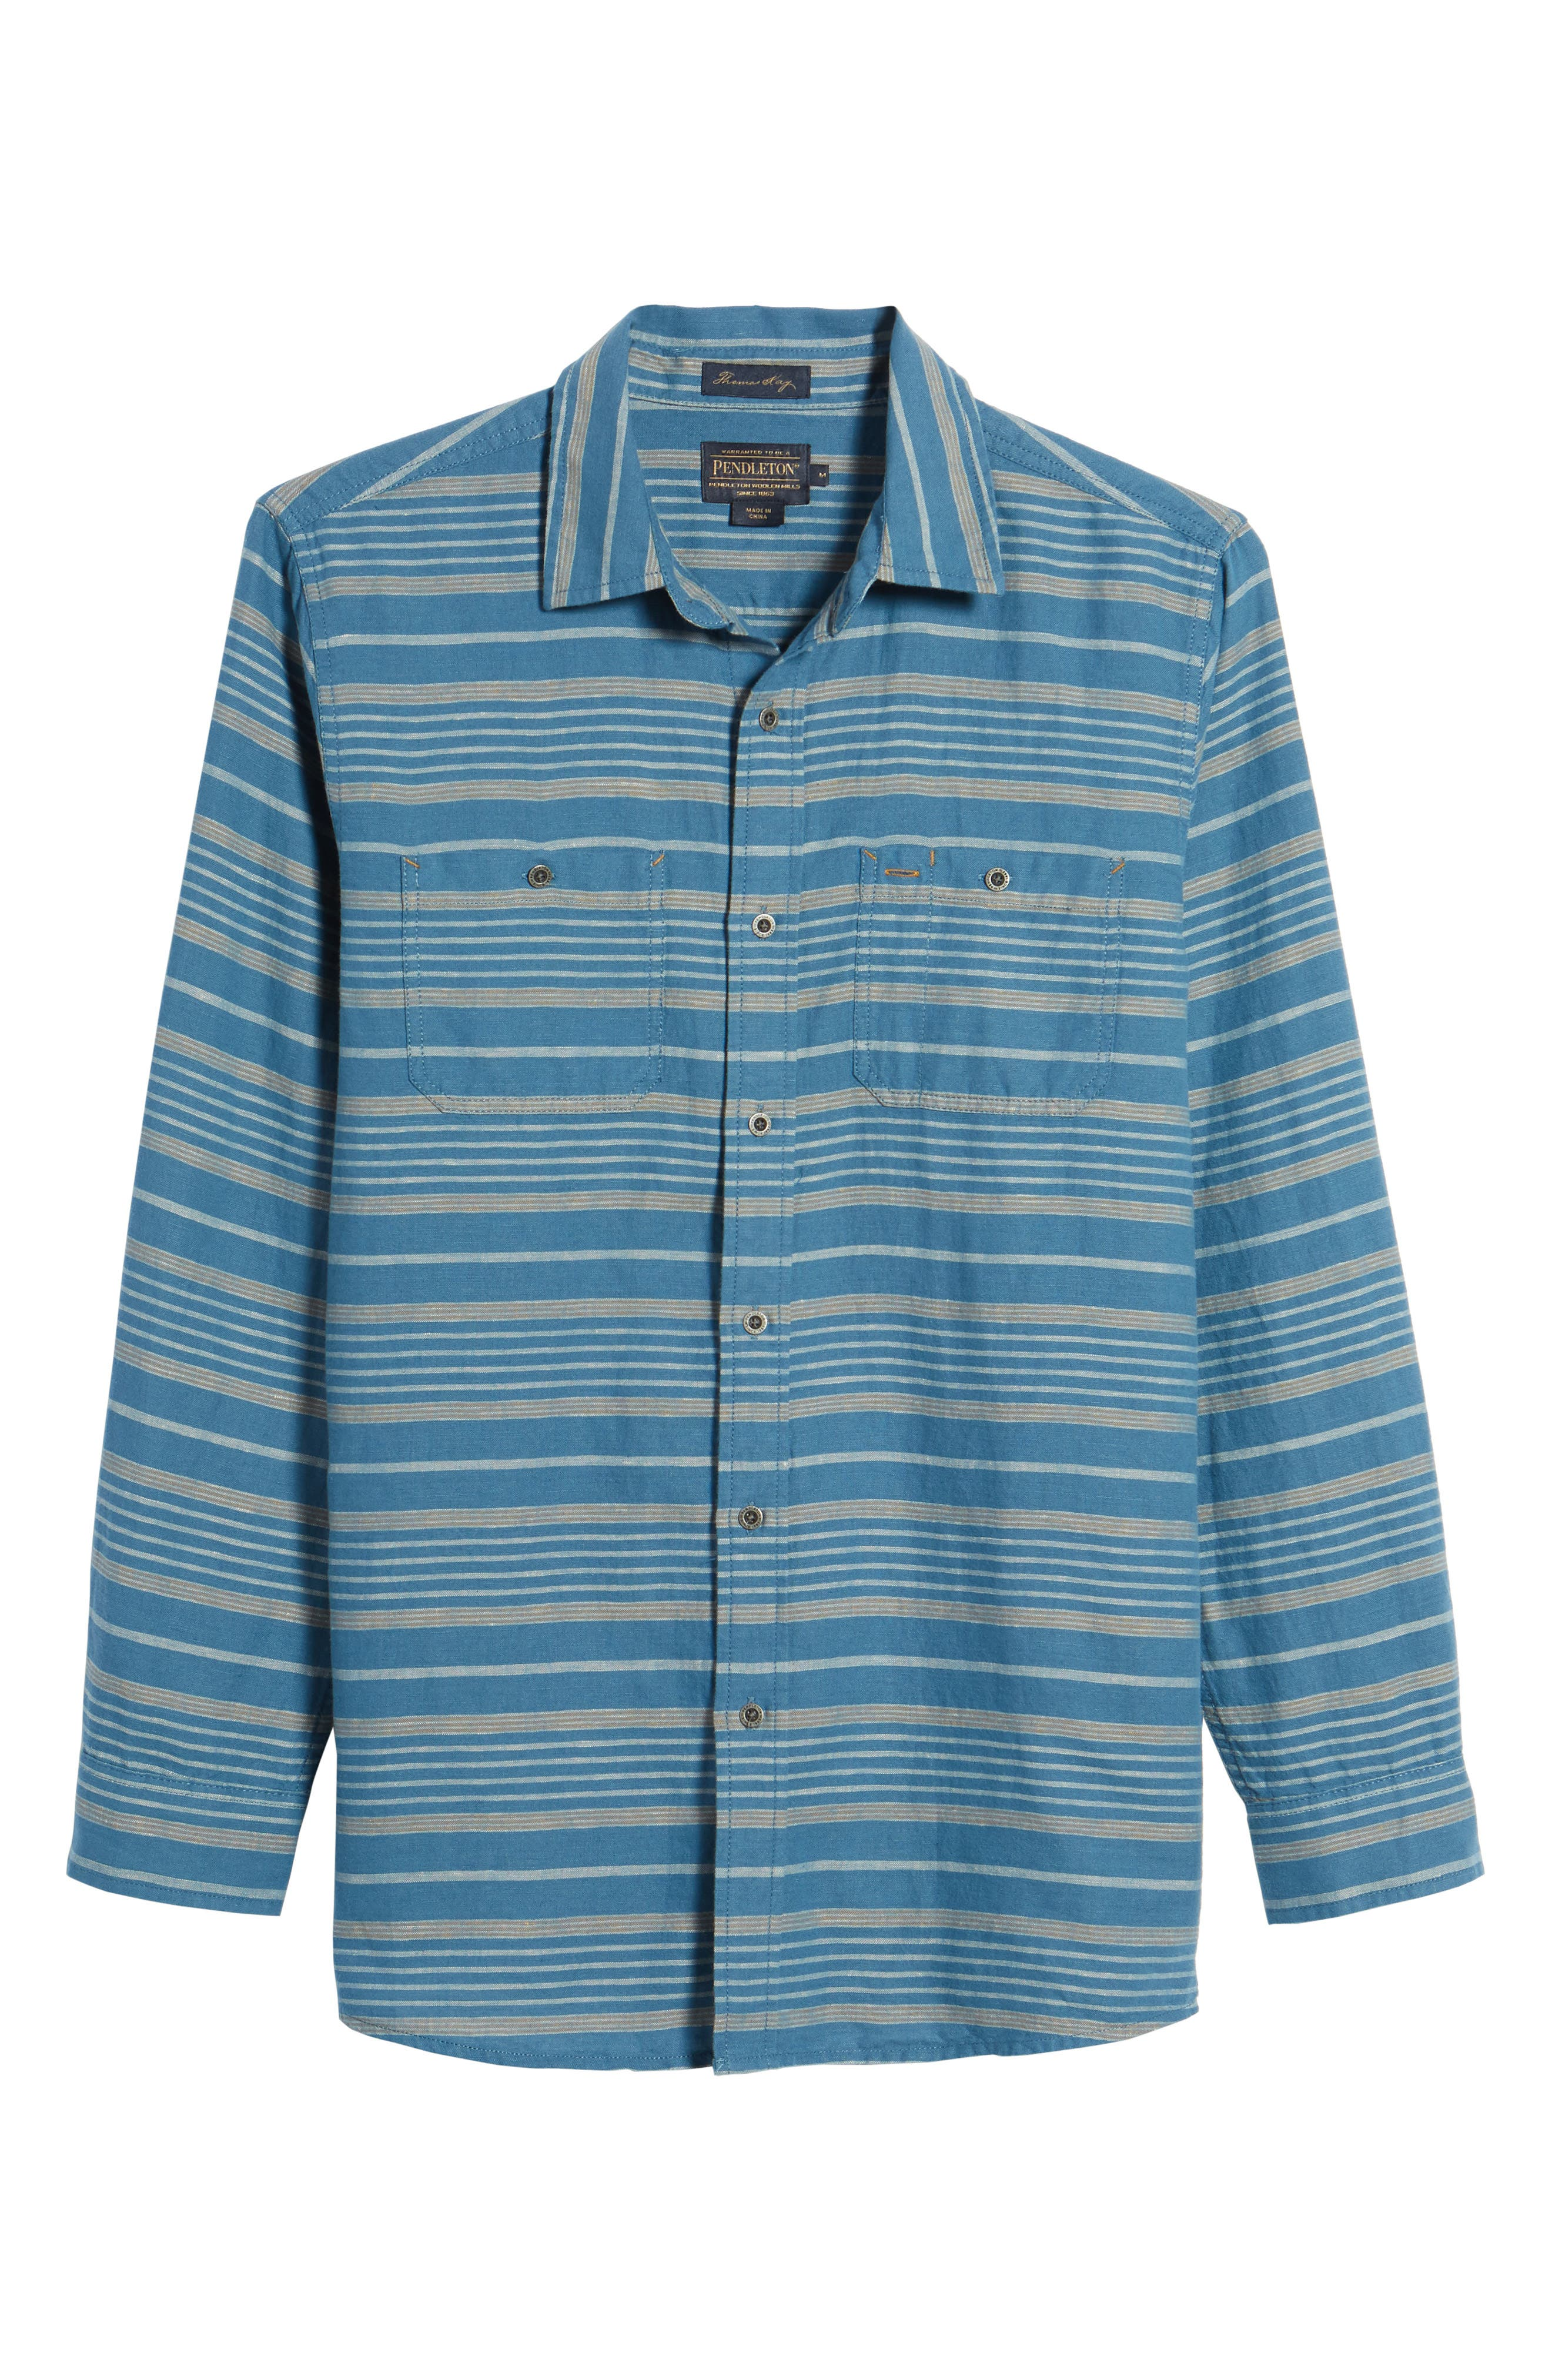 Kay Street Fitted Shirt,                             Alternate thumbnail 6, color,                             Navy/ Cream Stripe